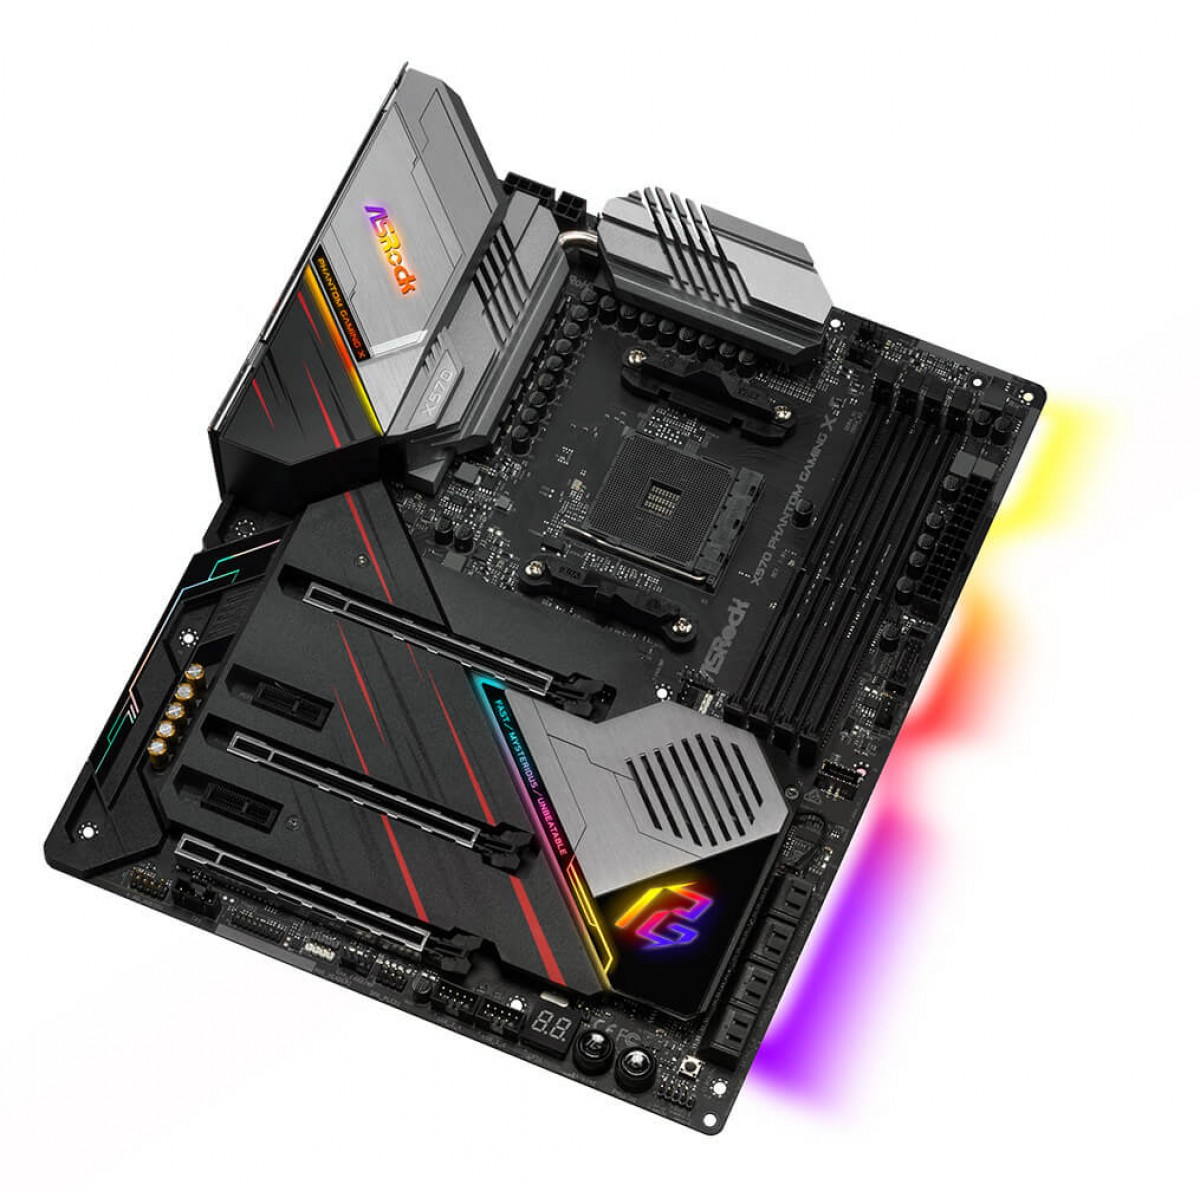 Placa Mãe ASRock X570 Phantom Gaming X Wifi, Chipset X570, AMD AM4, ATX, DDR4, 90-MXBAN0-A0UAYZ